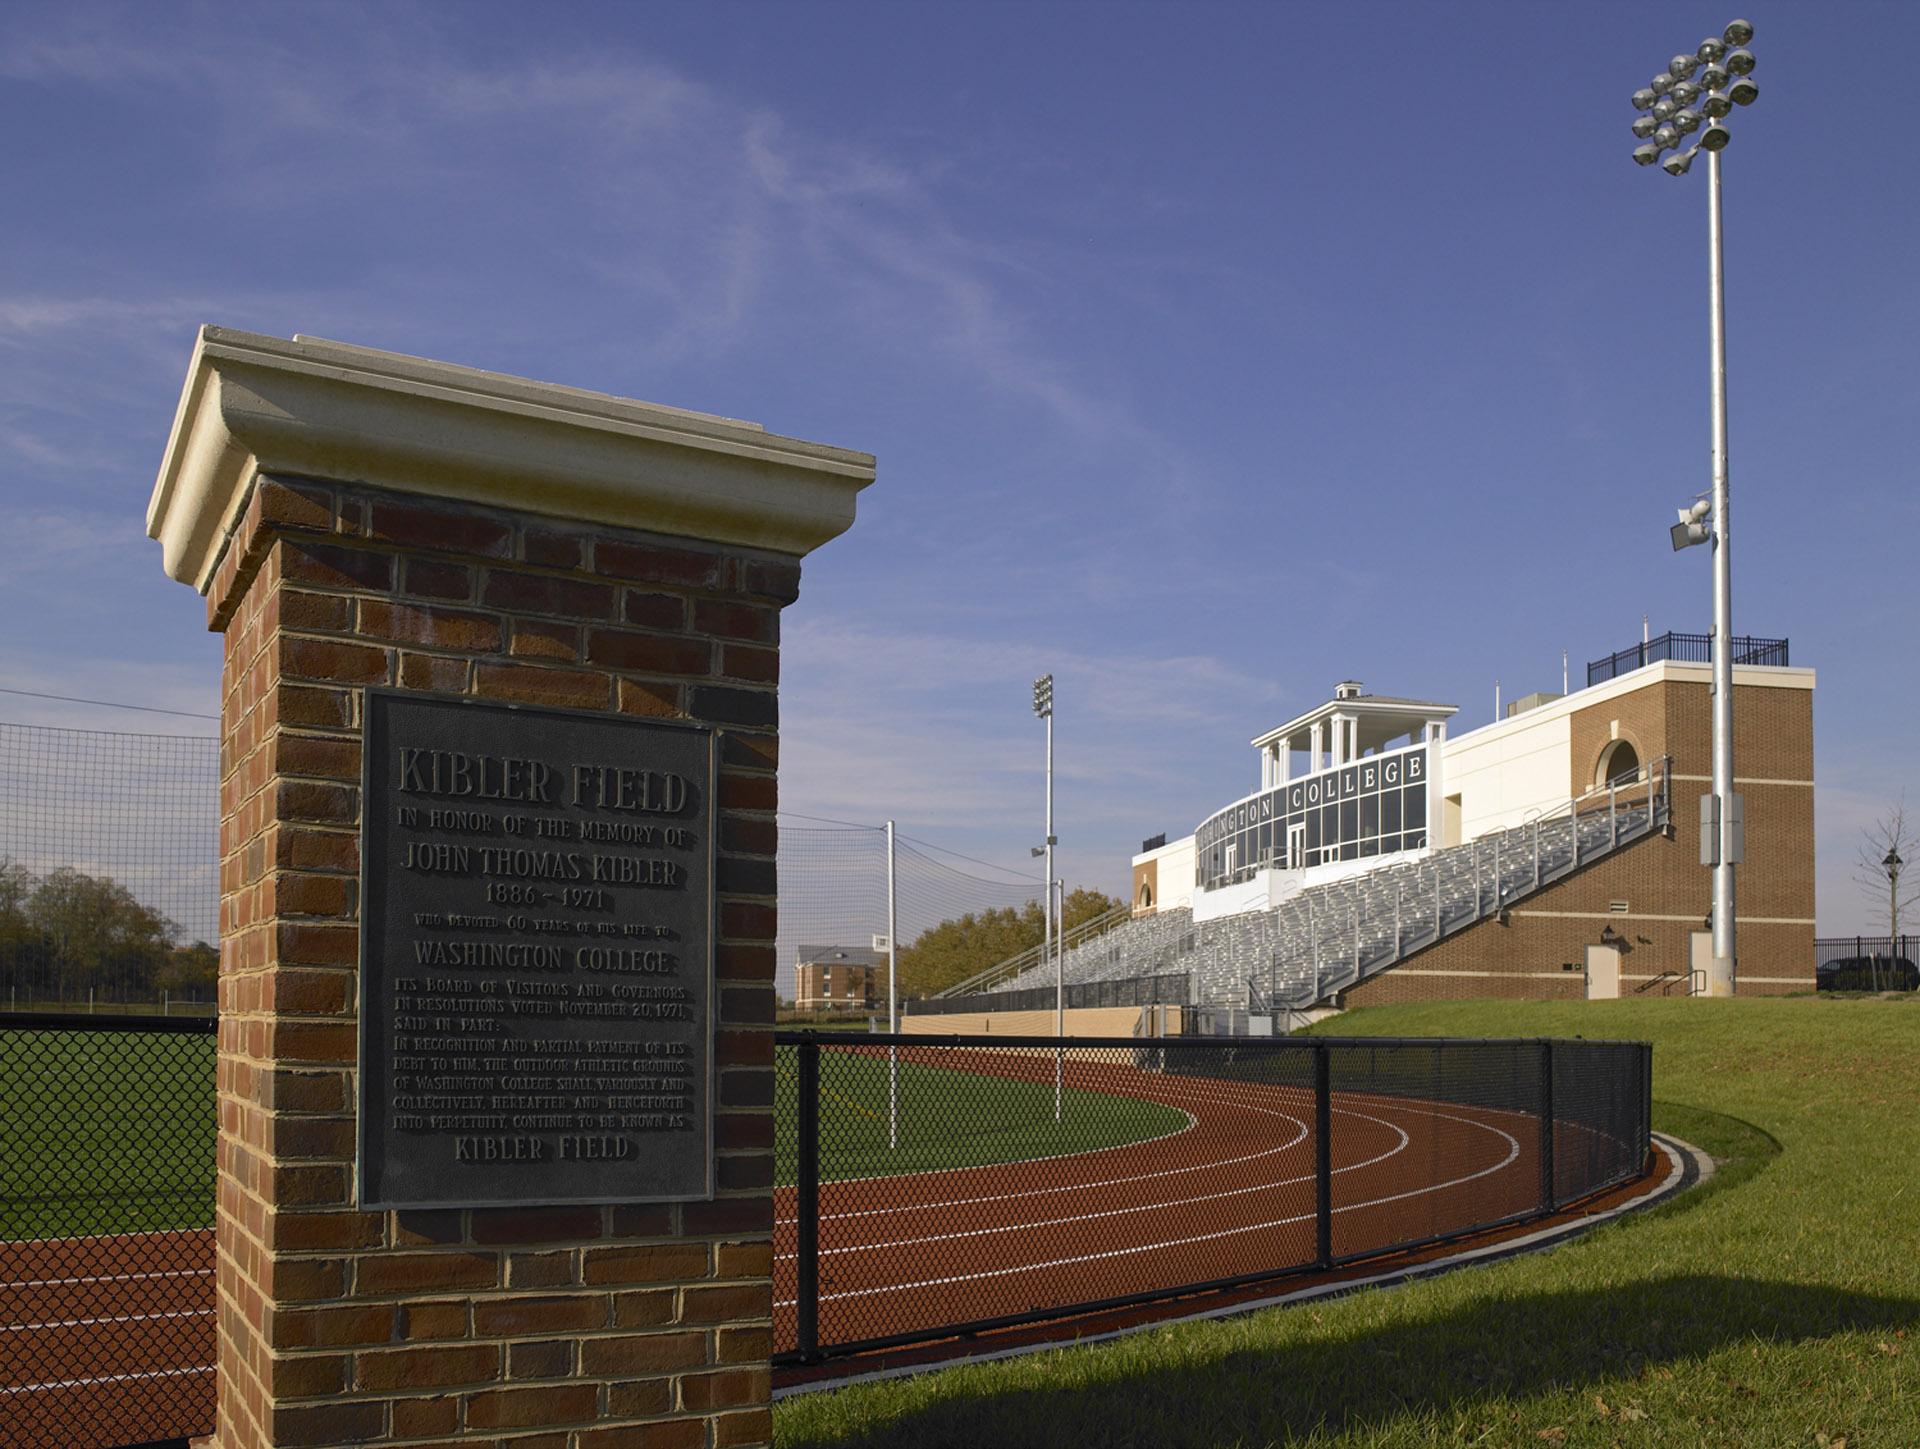 Washington College Kibler Field Plaque